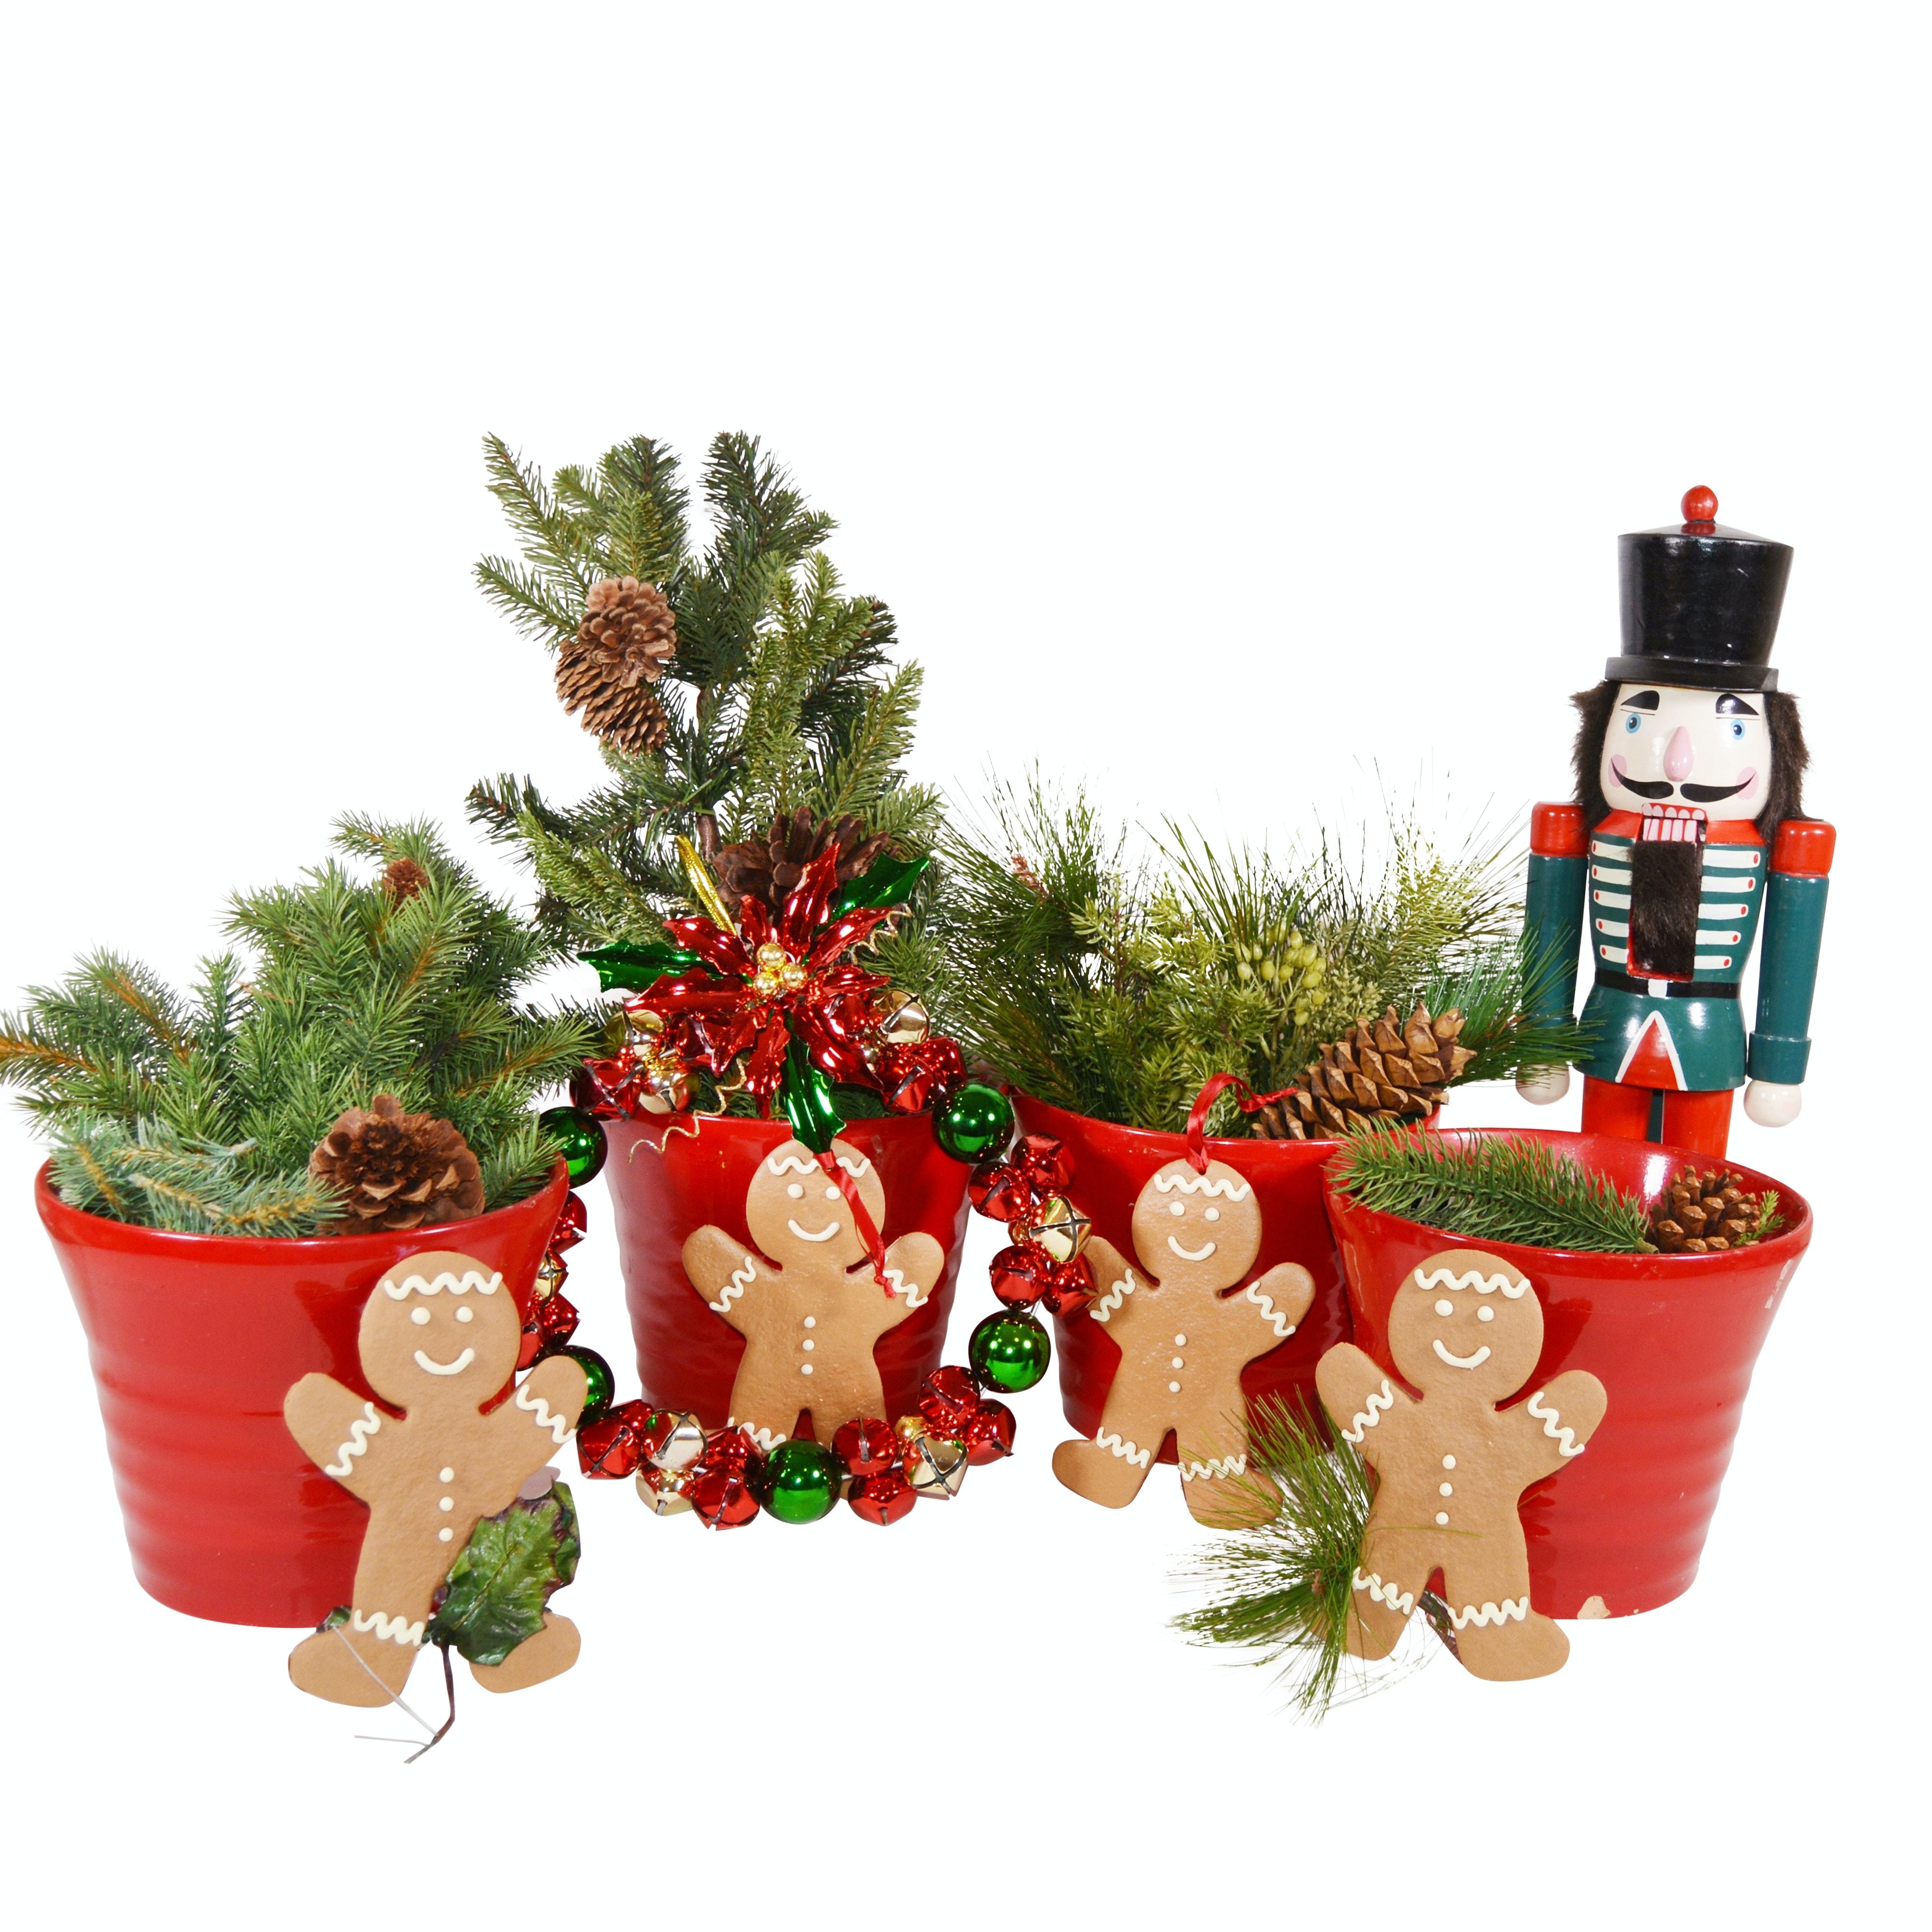 Ceramic Planters and Holiday Decor